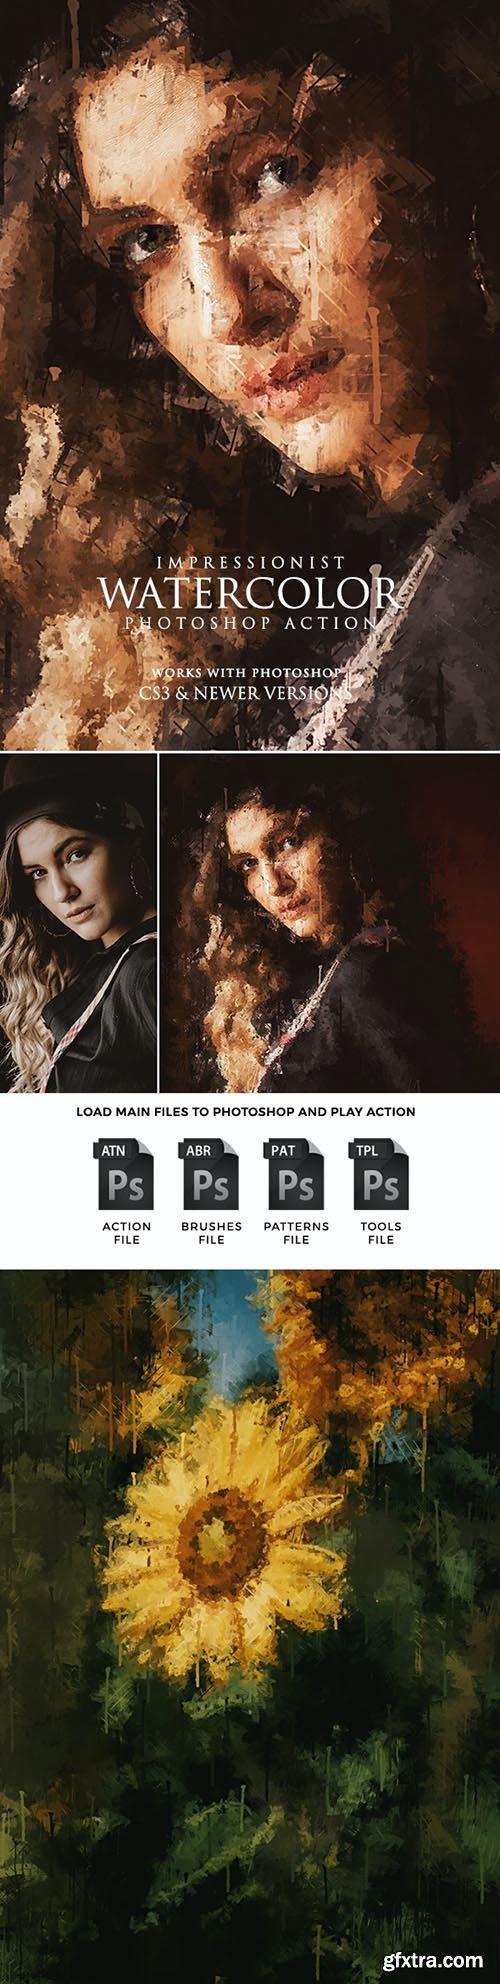 GraphicRiver - Impressionist Watercolor Photoshop Action 31905324